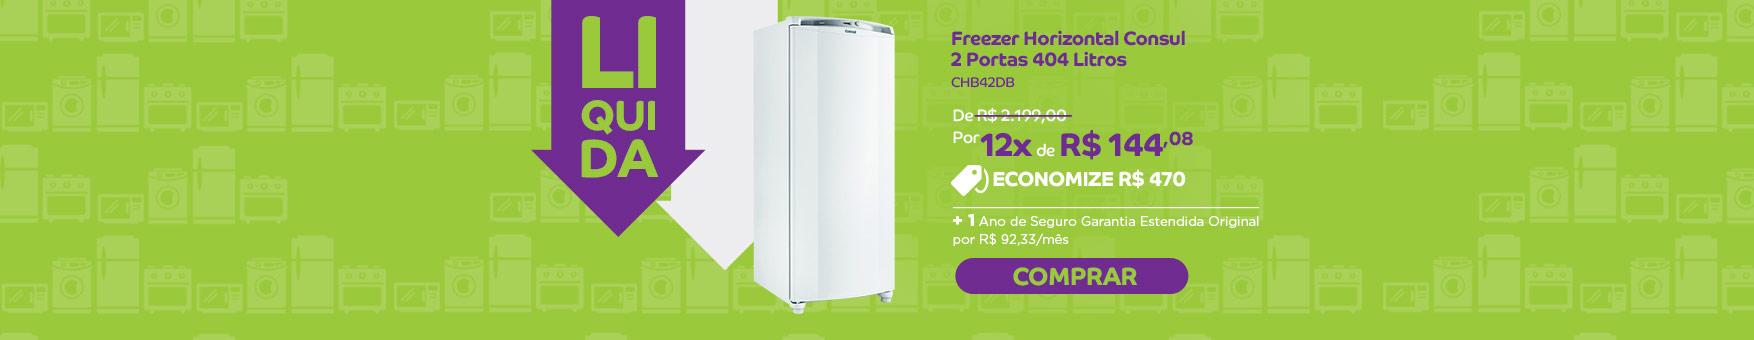 Promoção Interna - 184 - liquida_chb42db_home_31072015 - chb42db - 3